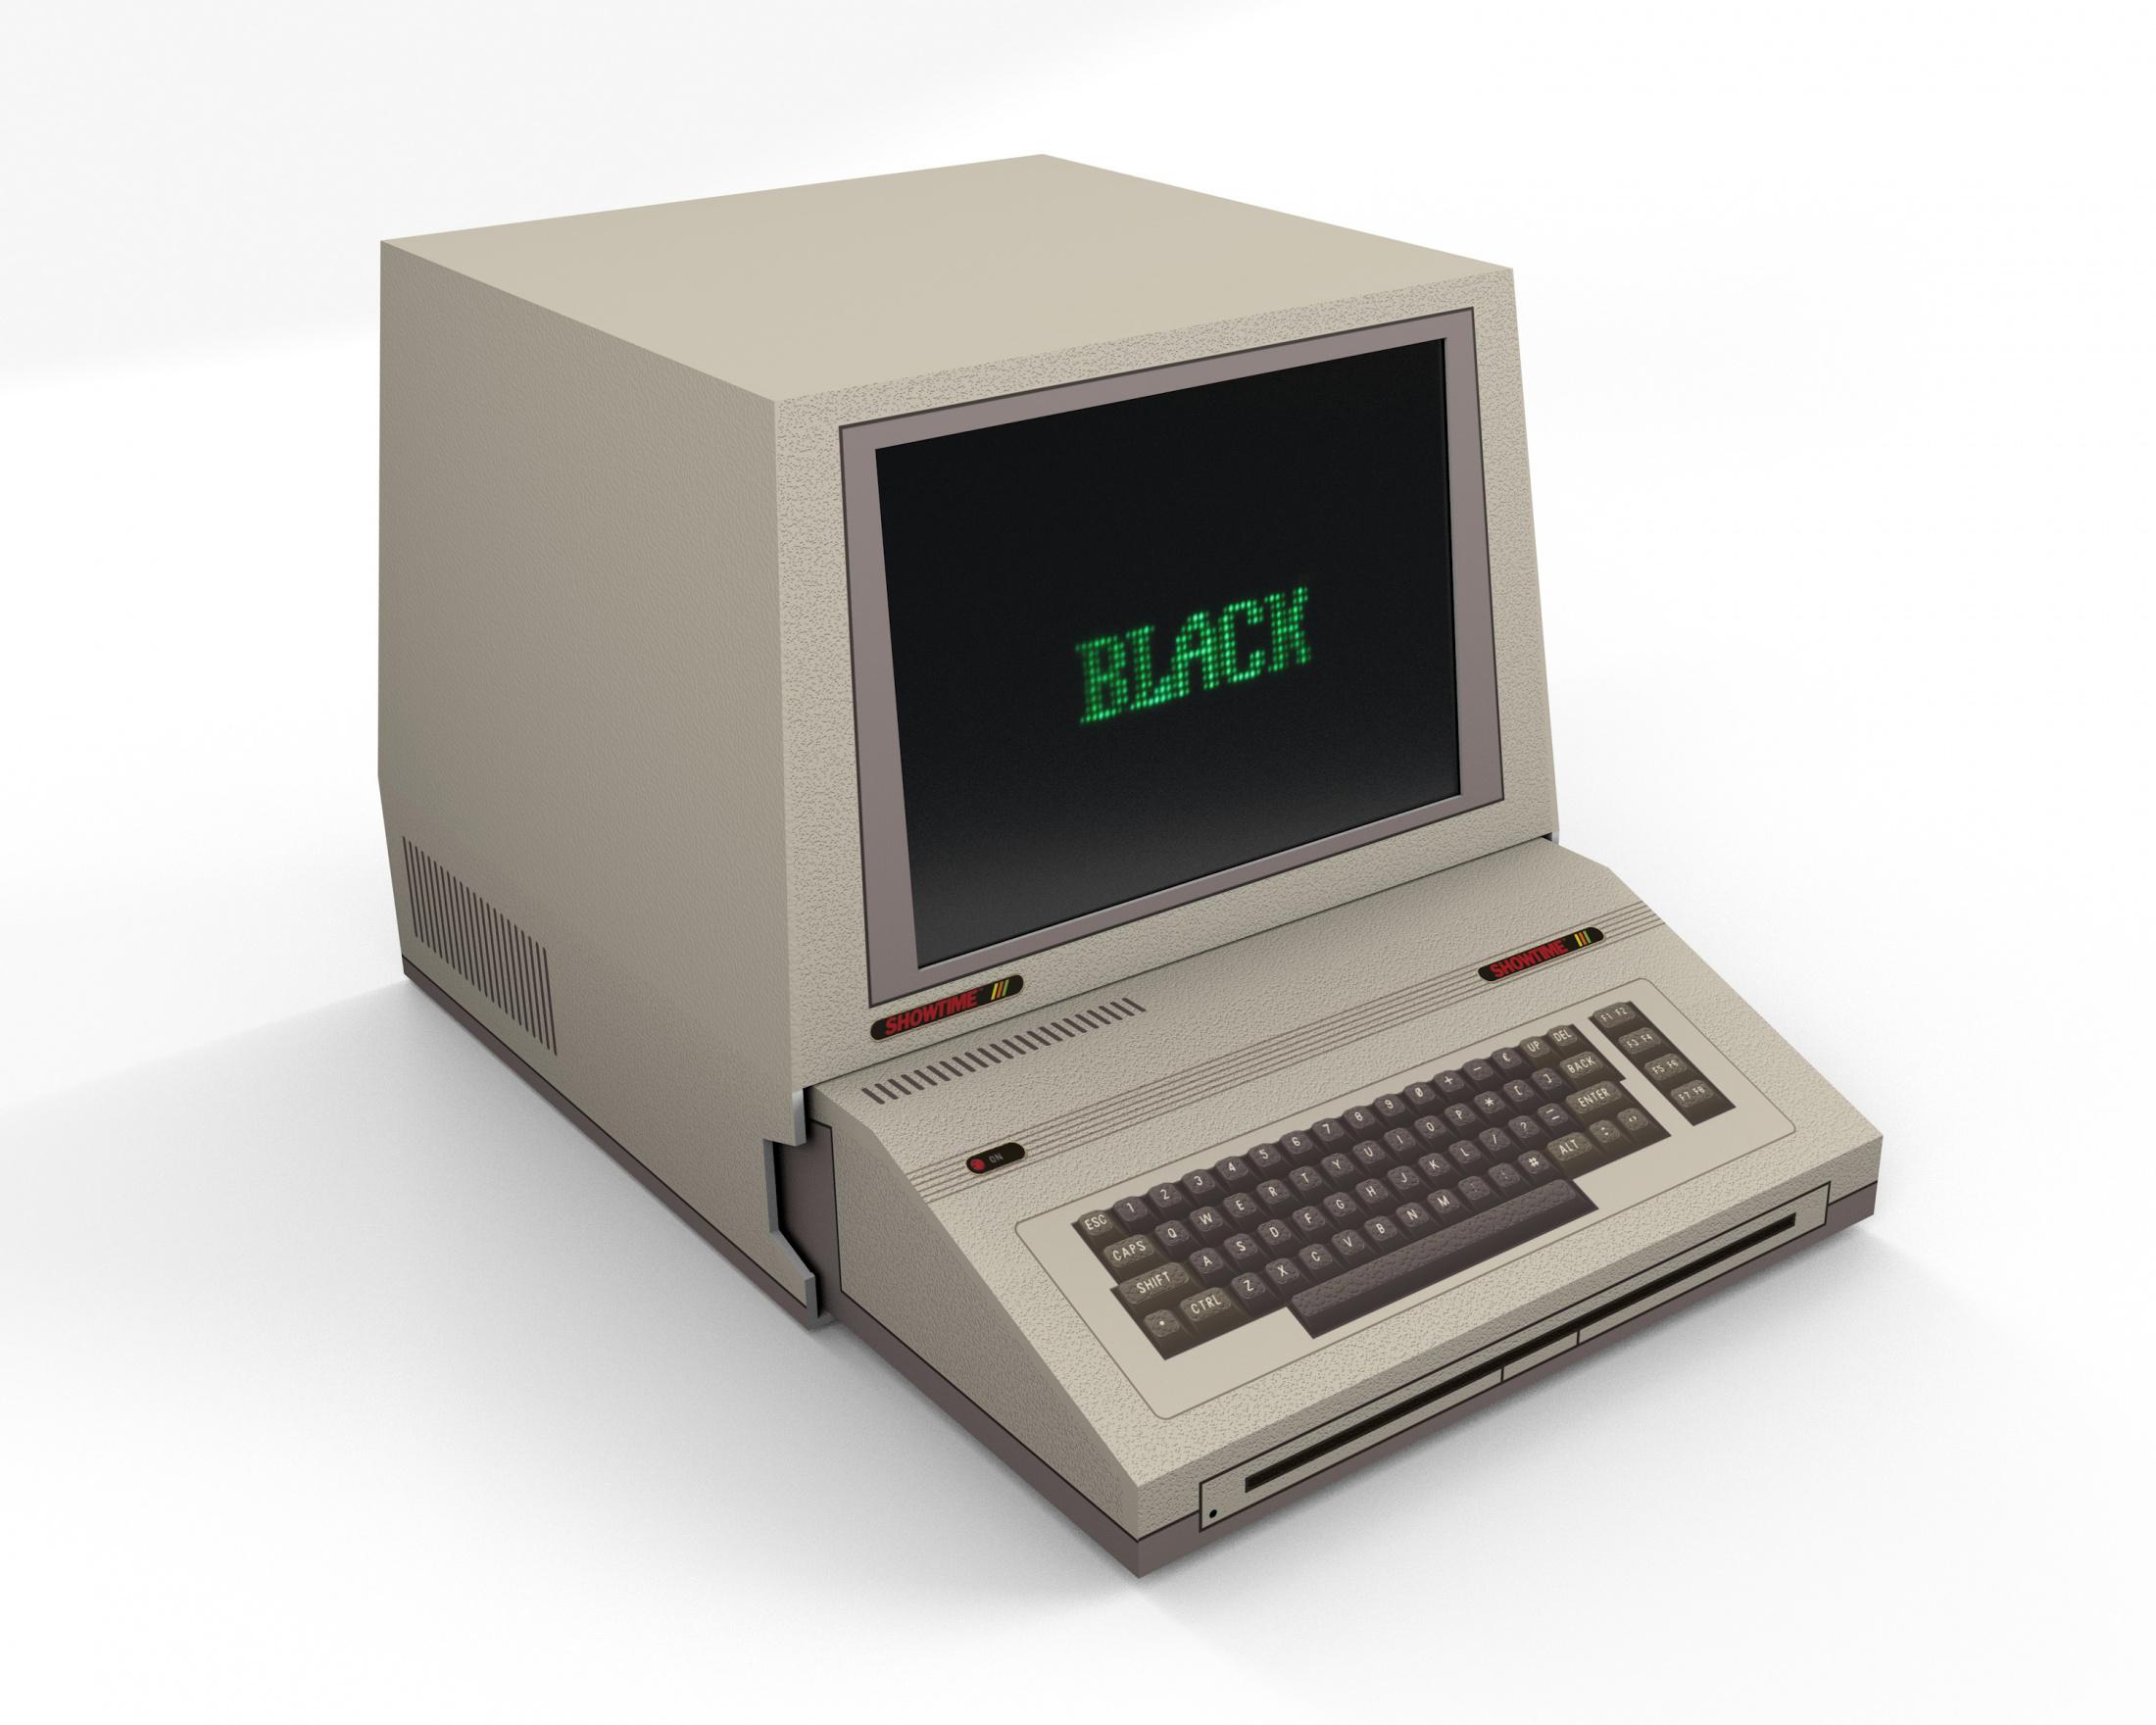 Thumbnail for Black Monday mailer